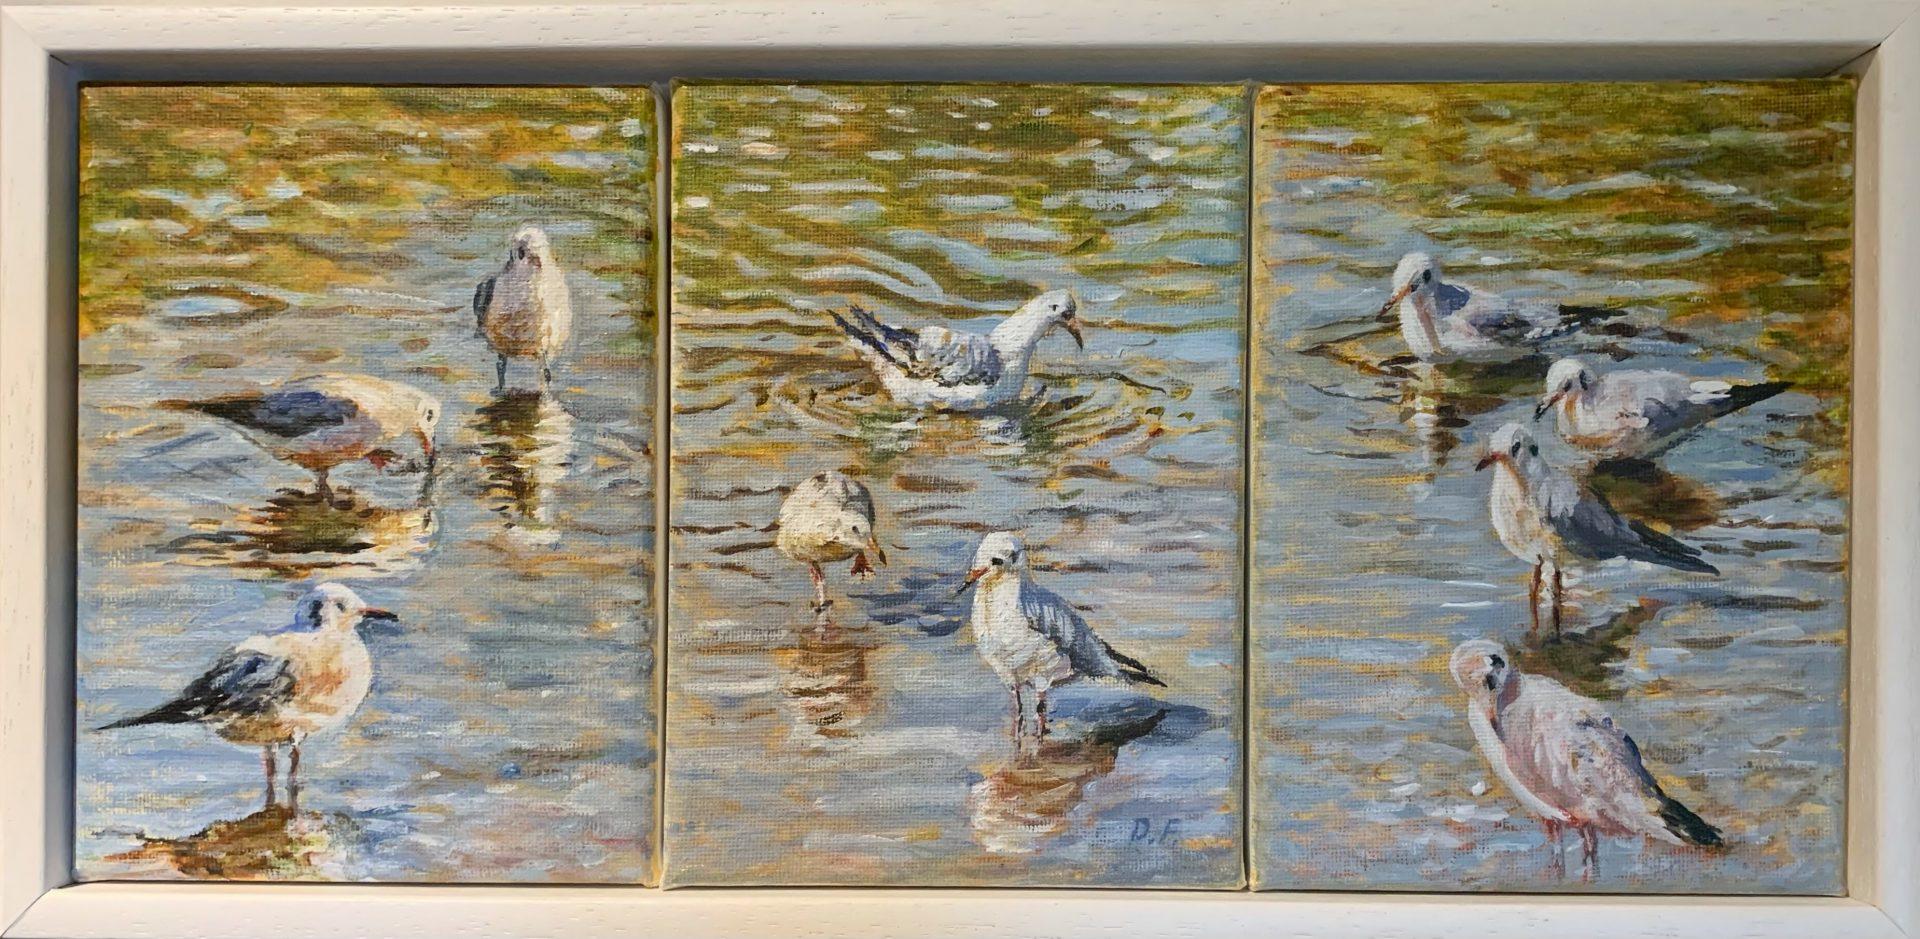 REFLECTIONS BY DEBBIE FARQUHARSON